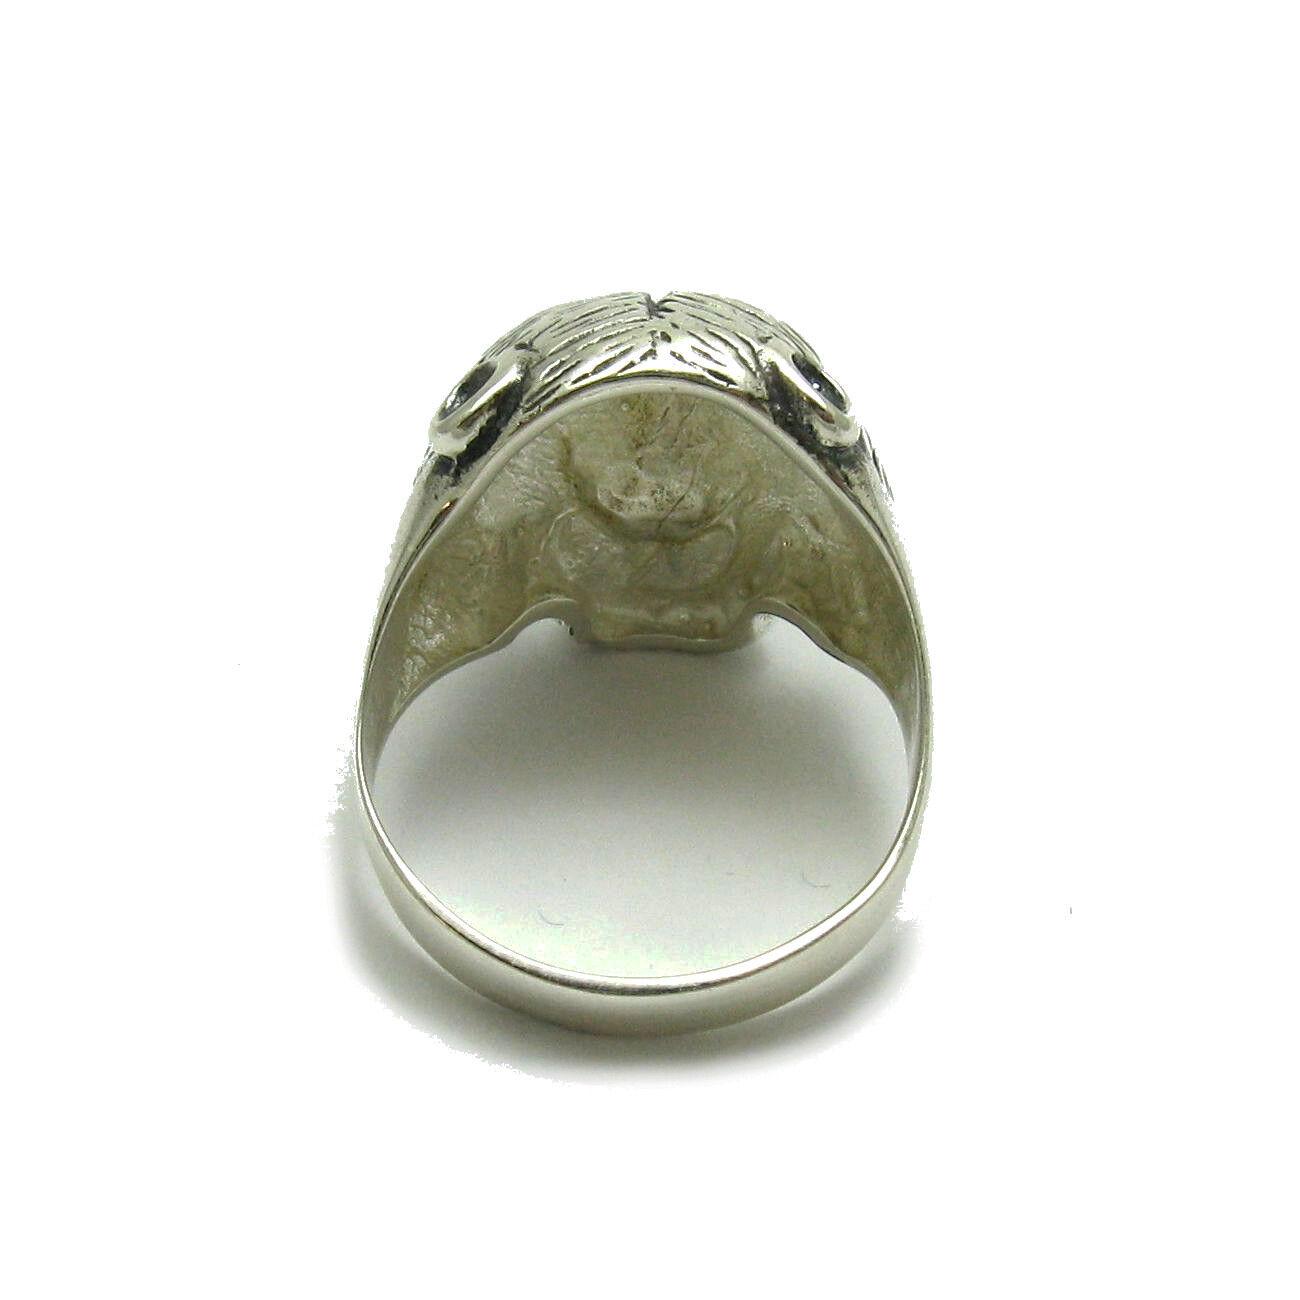 STERLING SILVER RING SOLID 925  HEDGEHOG HANDMADE R000810